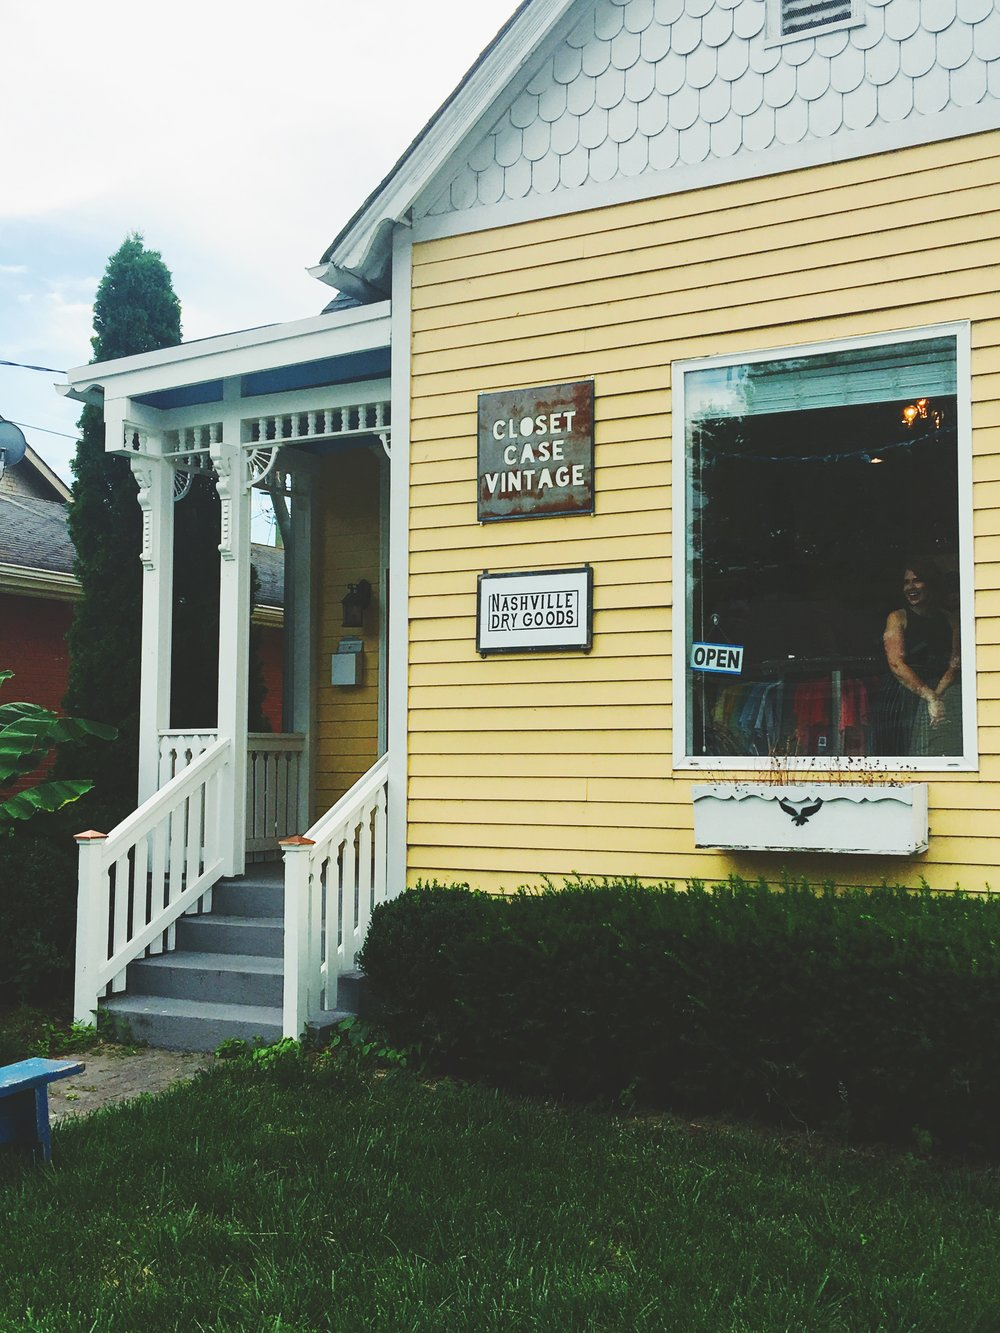 Closet Case Vintage/Nashville Dry Goods